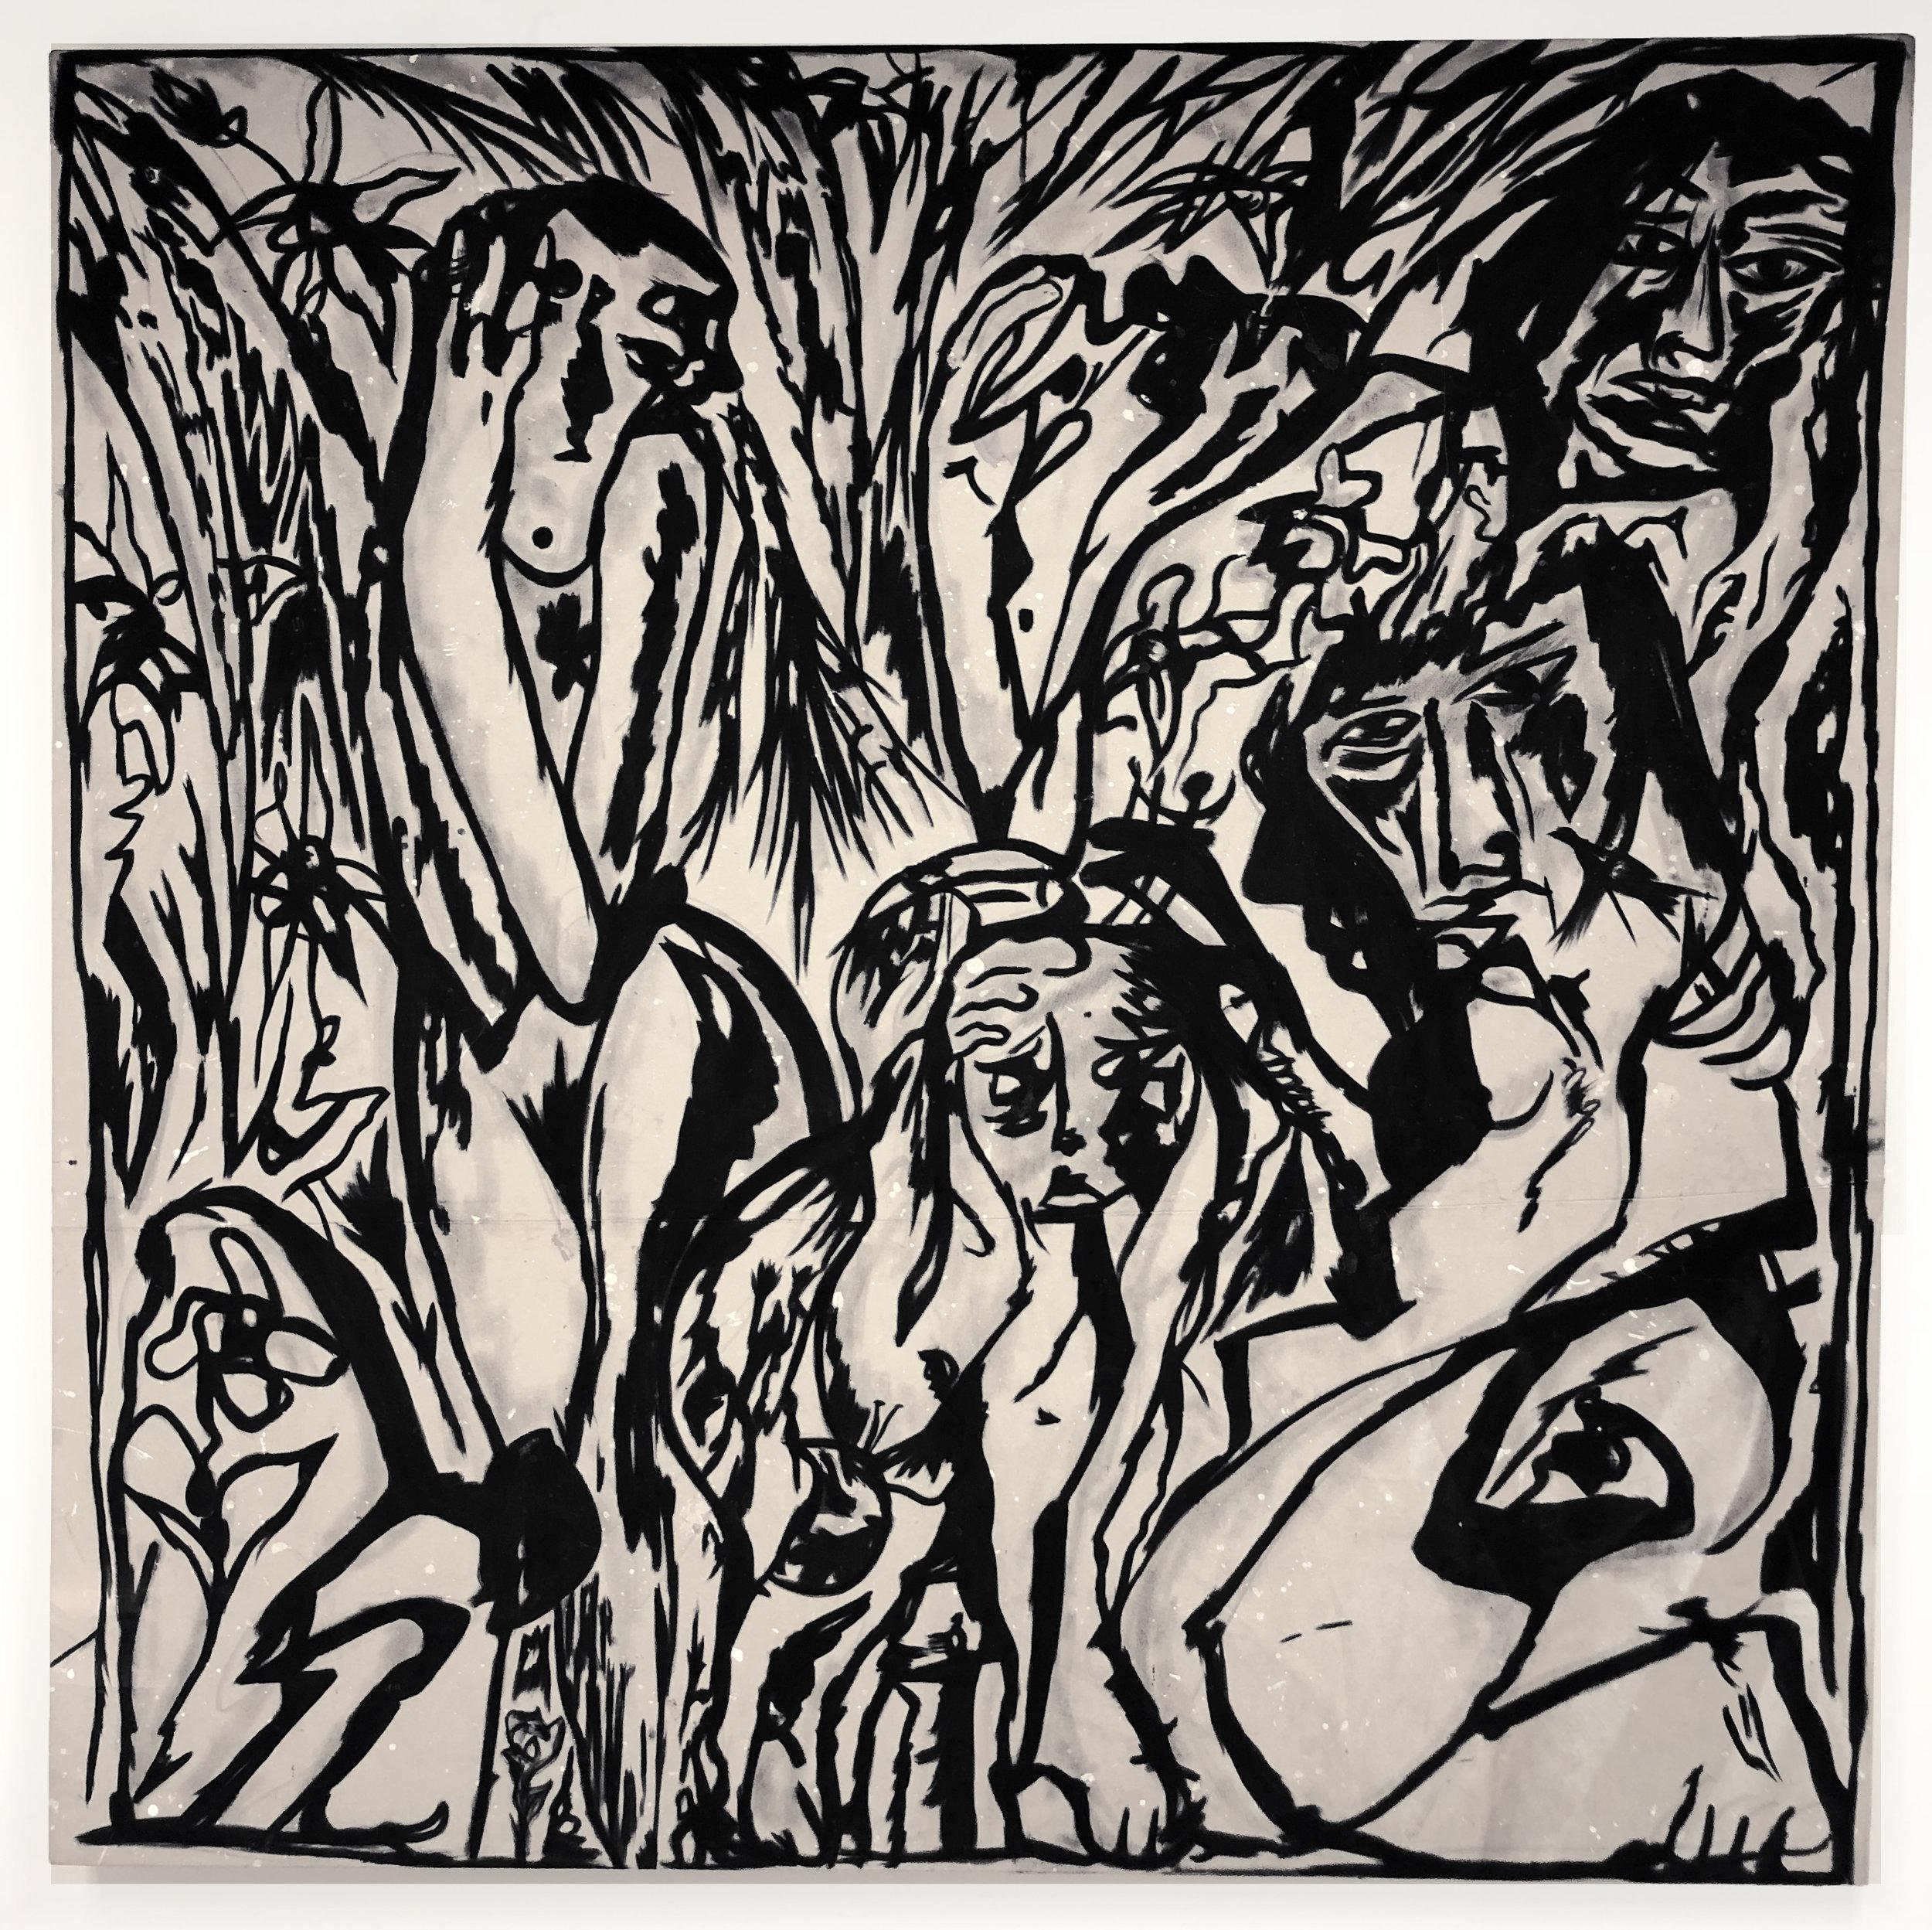 DG_Earthings_72x72_Charcoal&Ink on canvas_$8,000.jpg